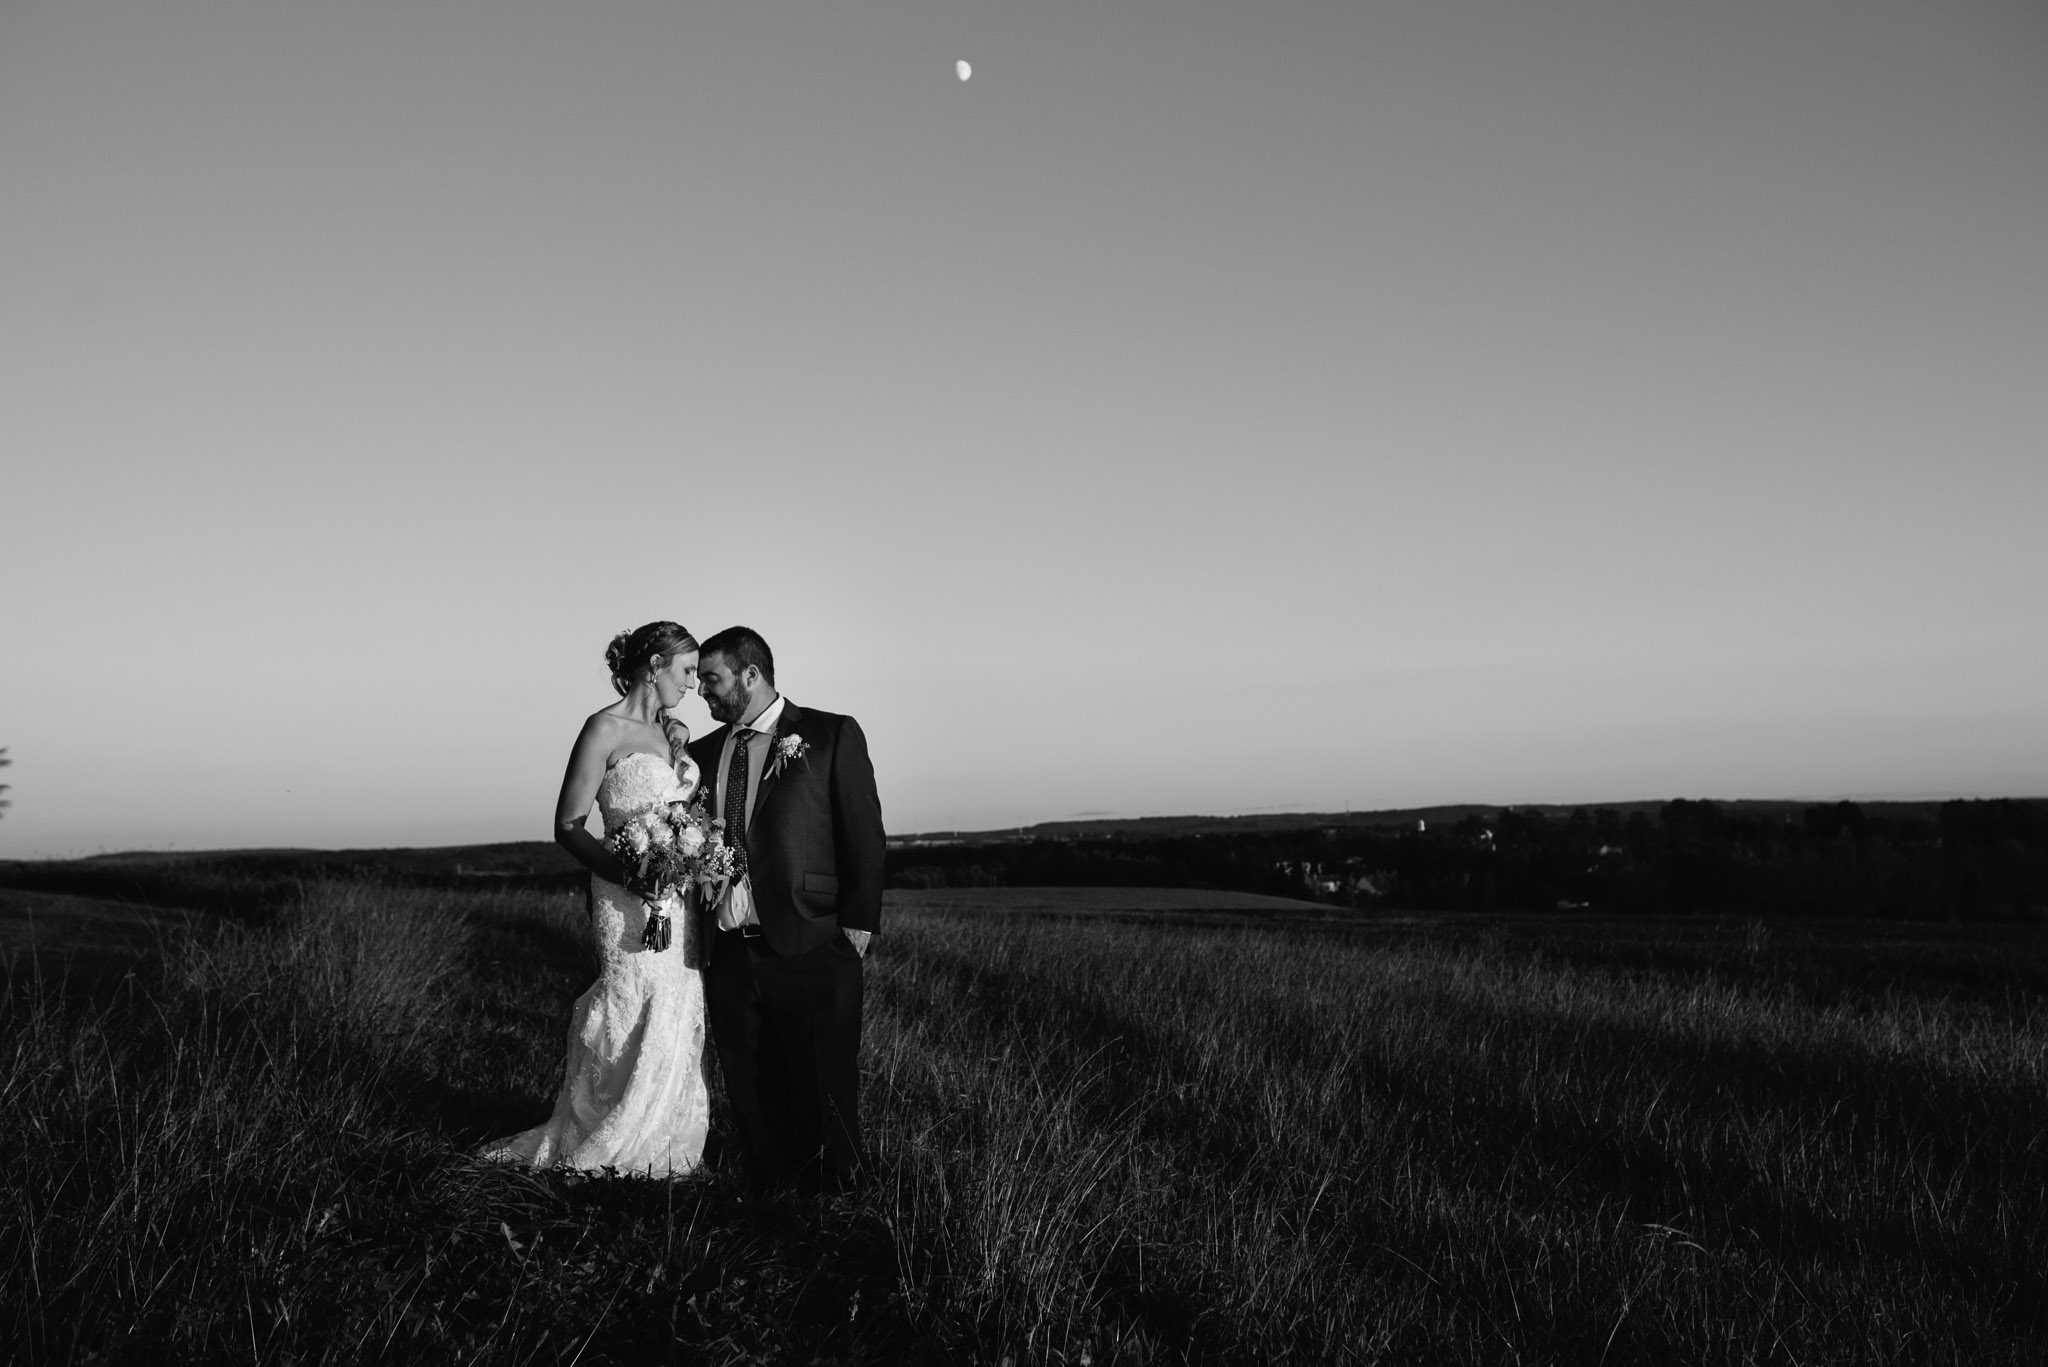 pittsburgh-ligonier-wedding-photographer-the-event-barn-at-highland-farms-55.jpg